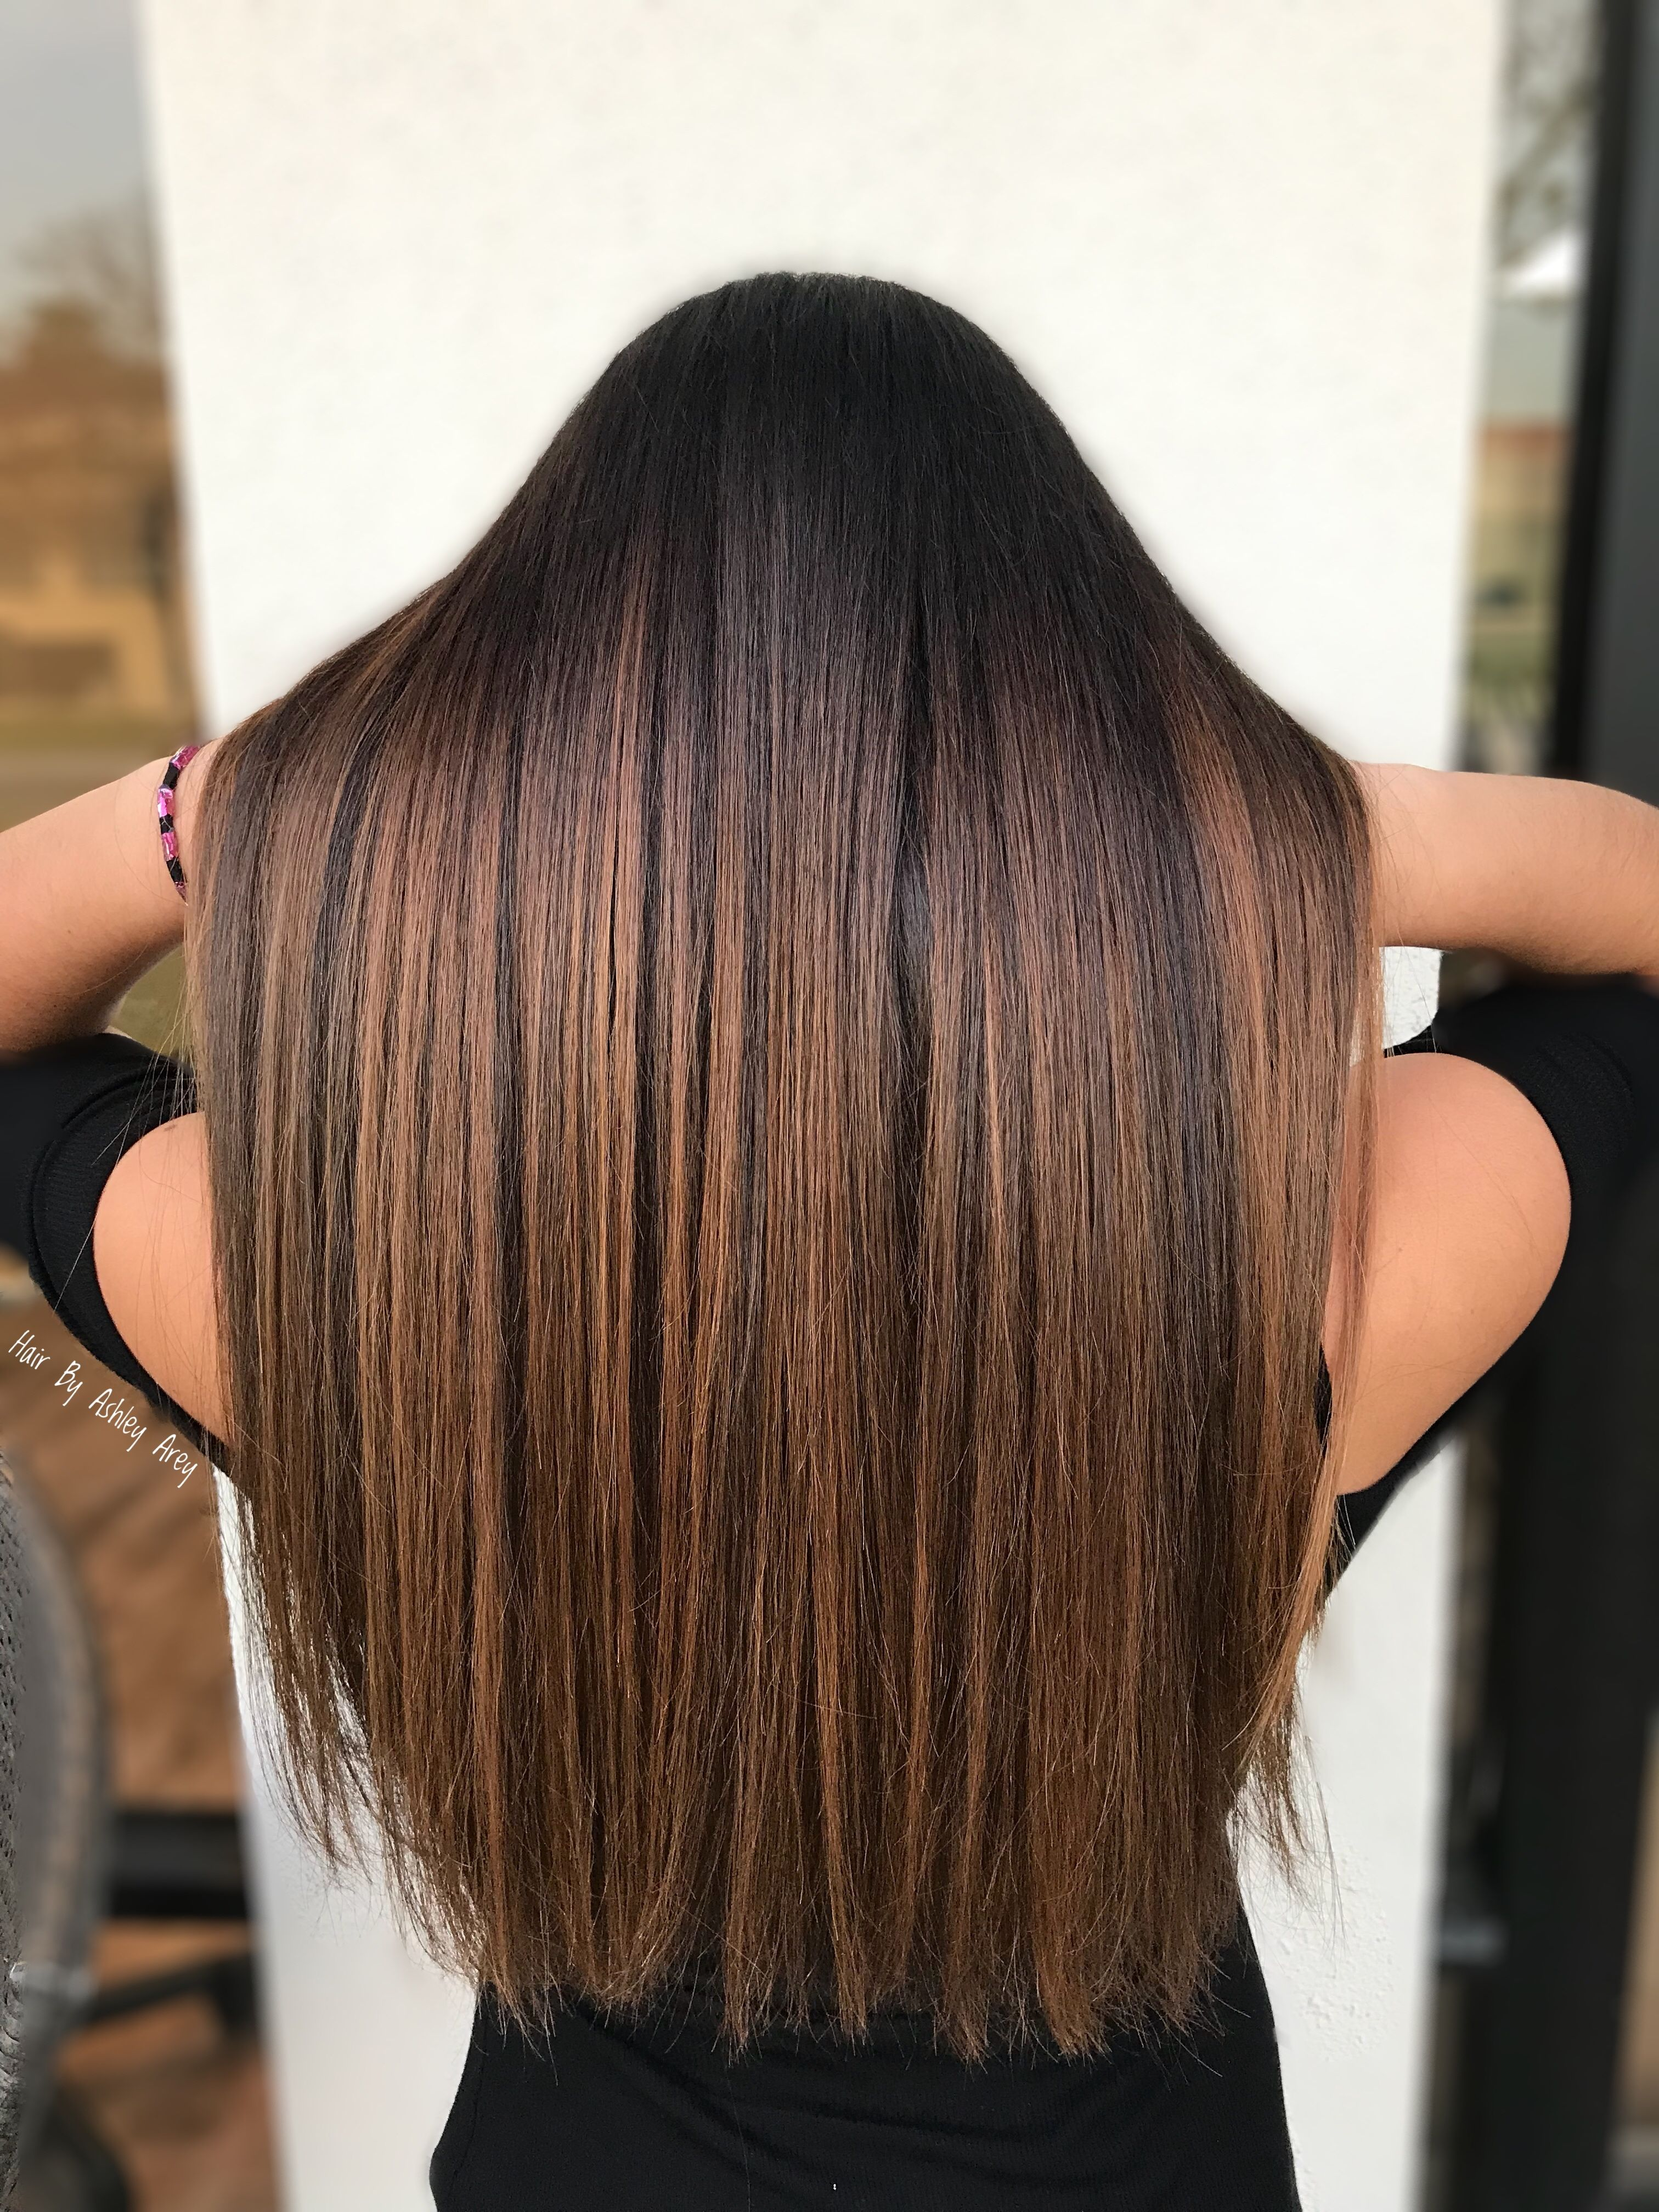 Caramel Balayage Hair By Ashleyarey Balayage Straight Hair Brown Straight Hair Straight Hair Highlights